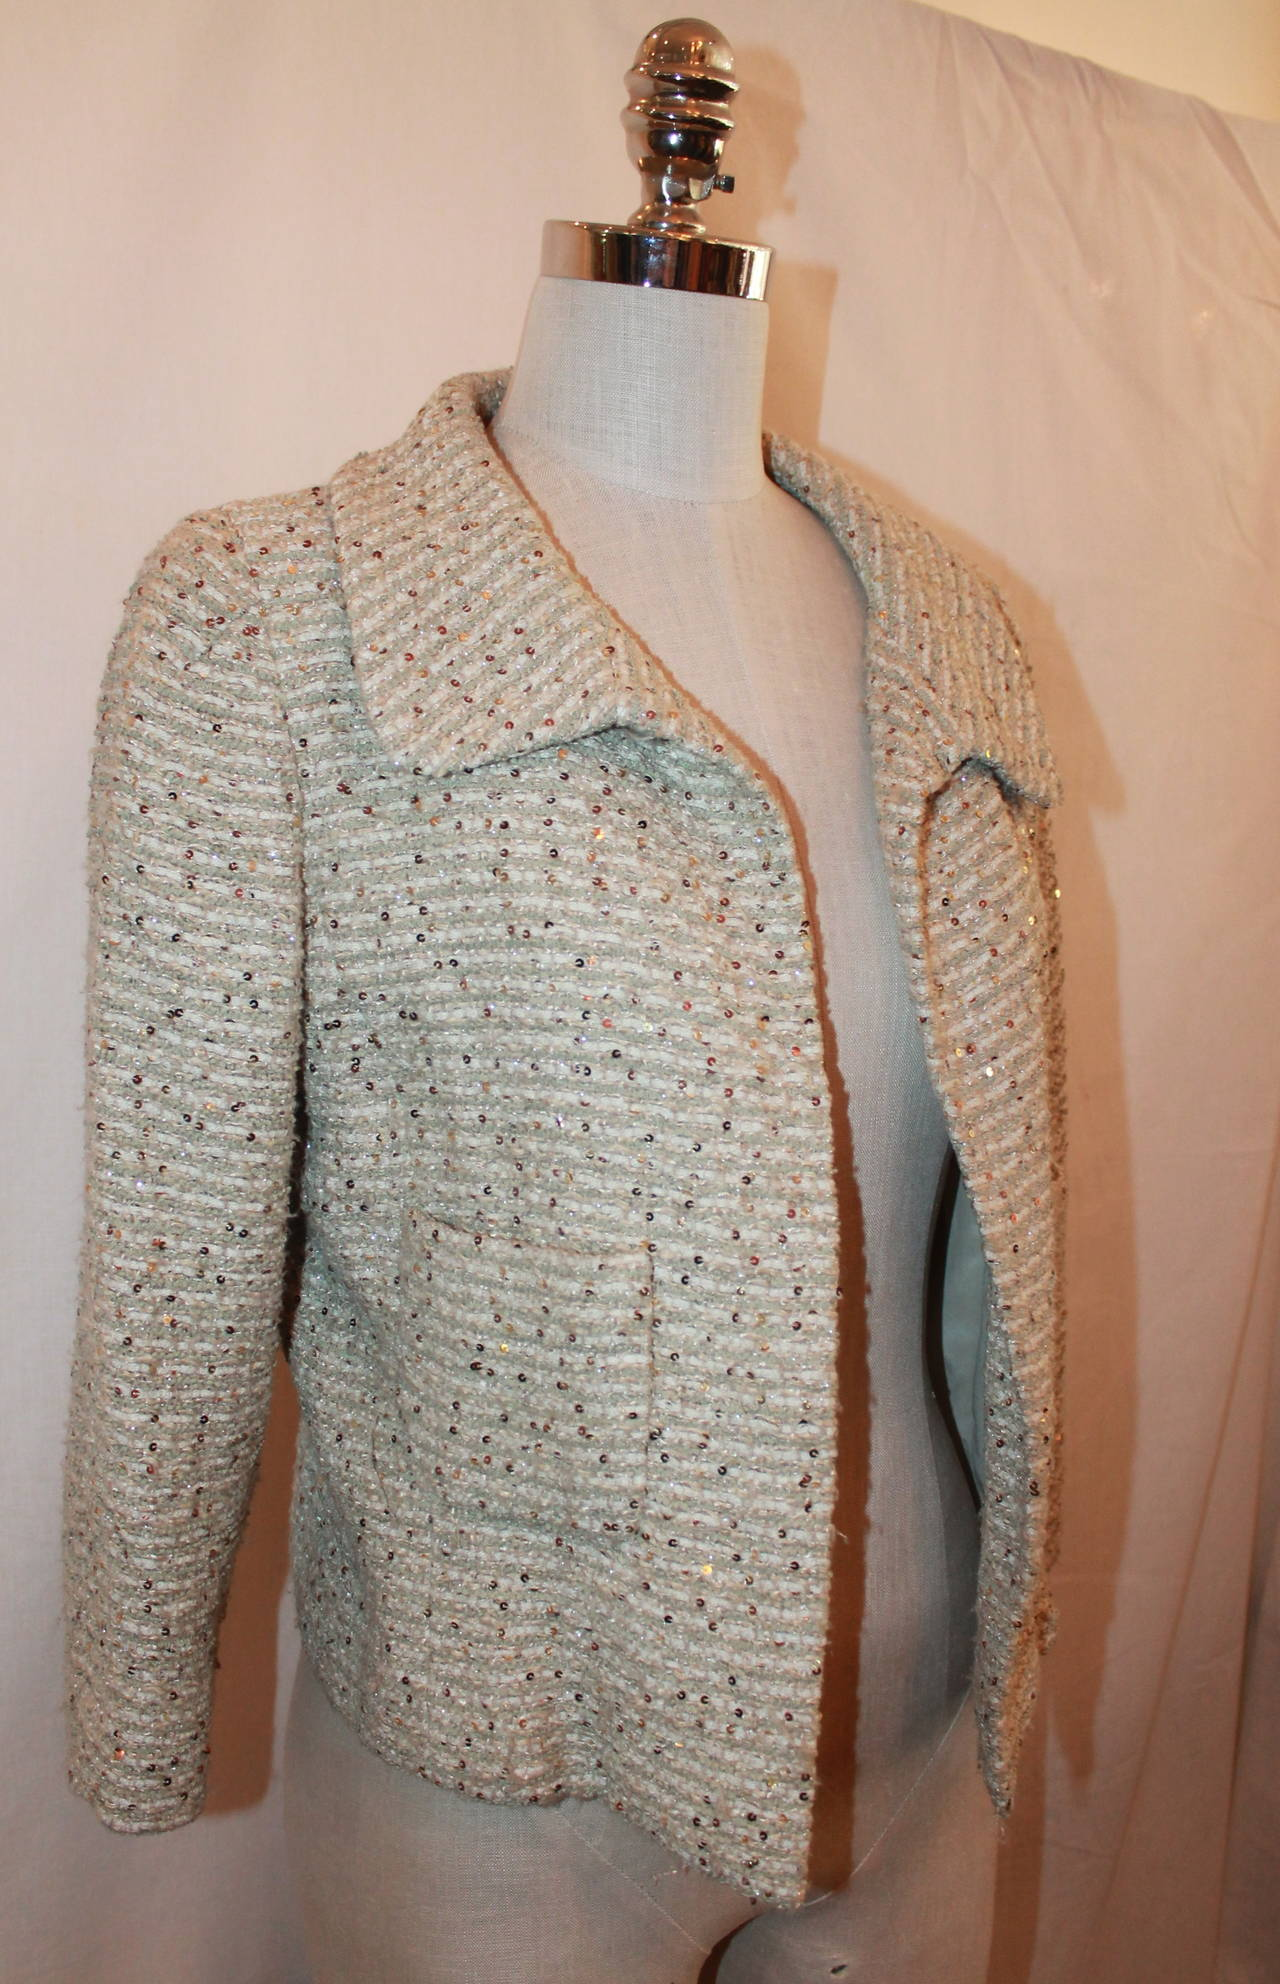 "Oscar De La Renta Cream Metallic Tweed with Sequin Jacket - 8. This jacket is in excellent condition with no pulls.  Measurements: Bust- 37"" Shoulder to Shoulder- 15"" Sleeve Length- 19"" Length- 20"""